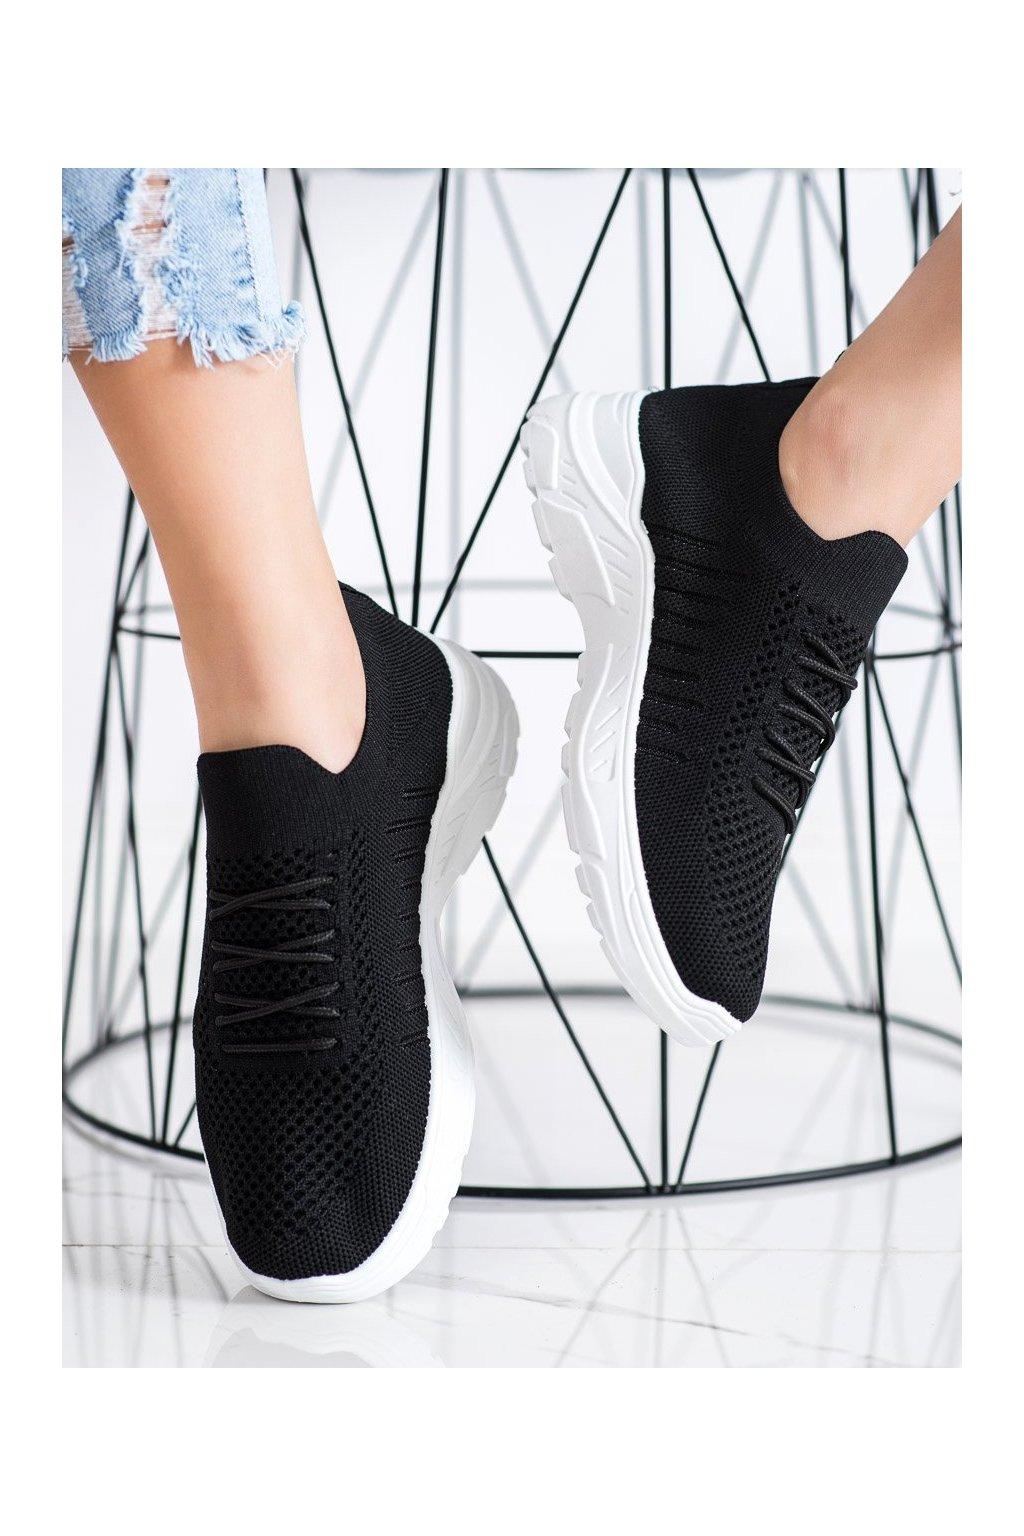 Čierne tenisky Sweet shoes kod L8073B